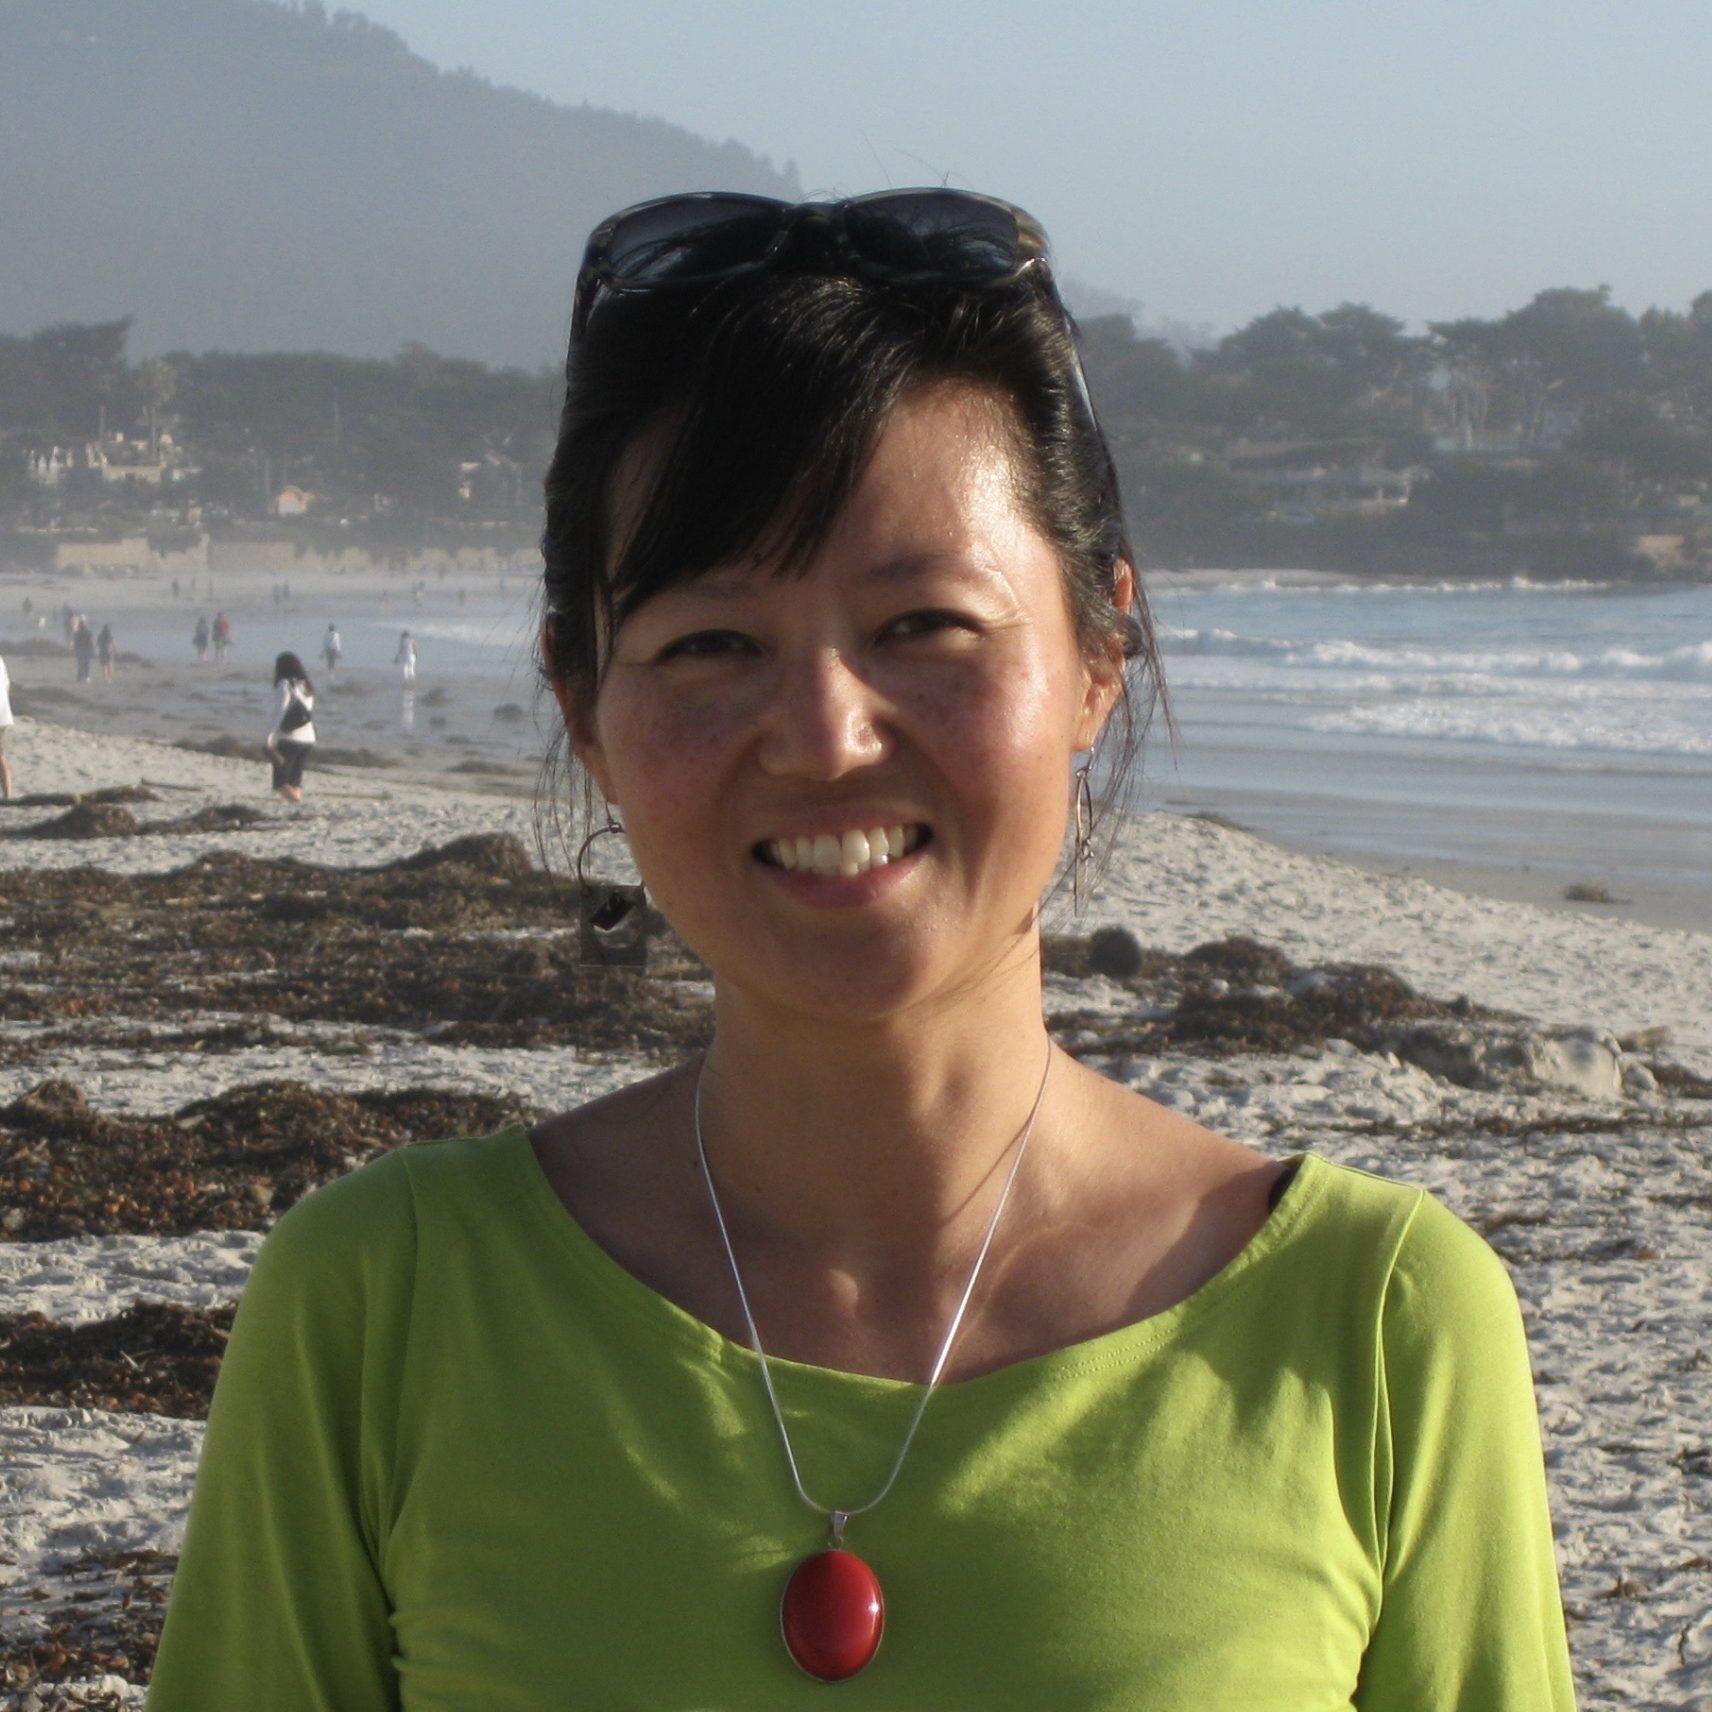 San Jose Chiropractor and Naturopathic Doctor Helen Bae